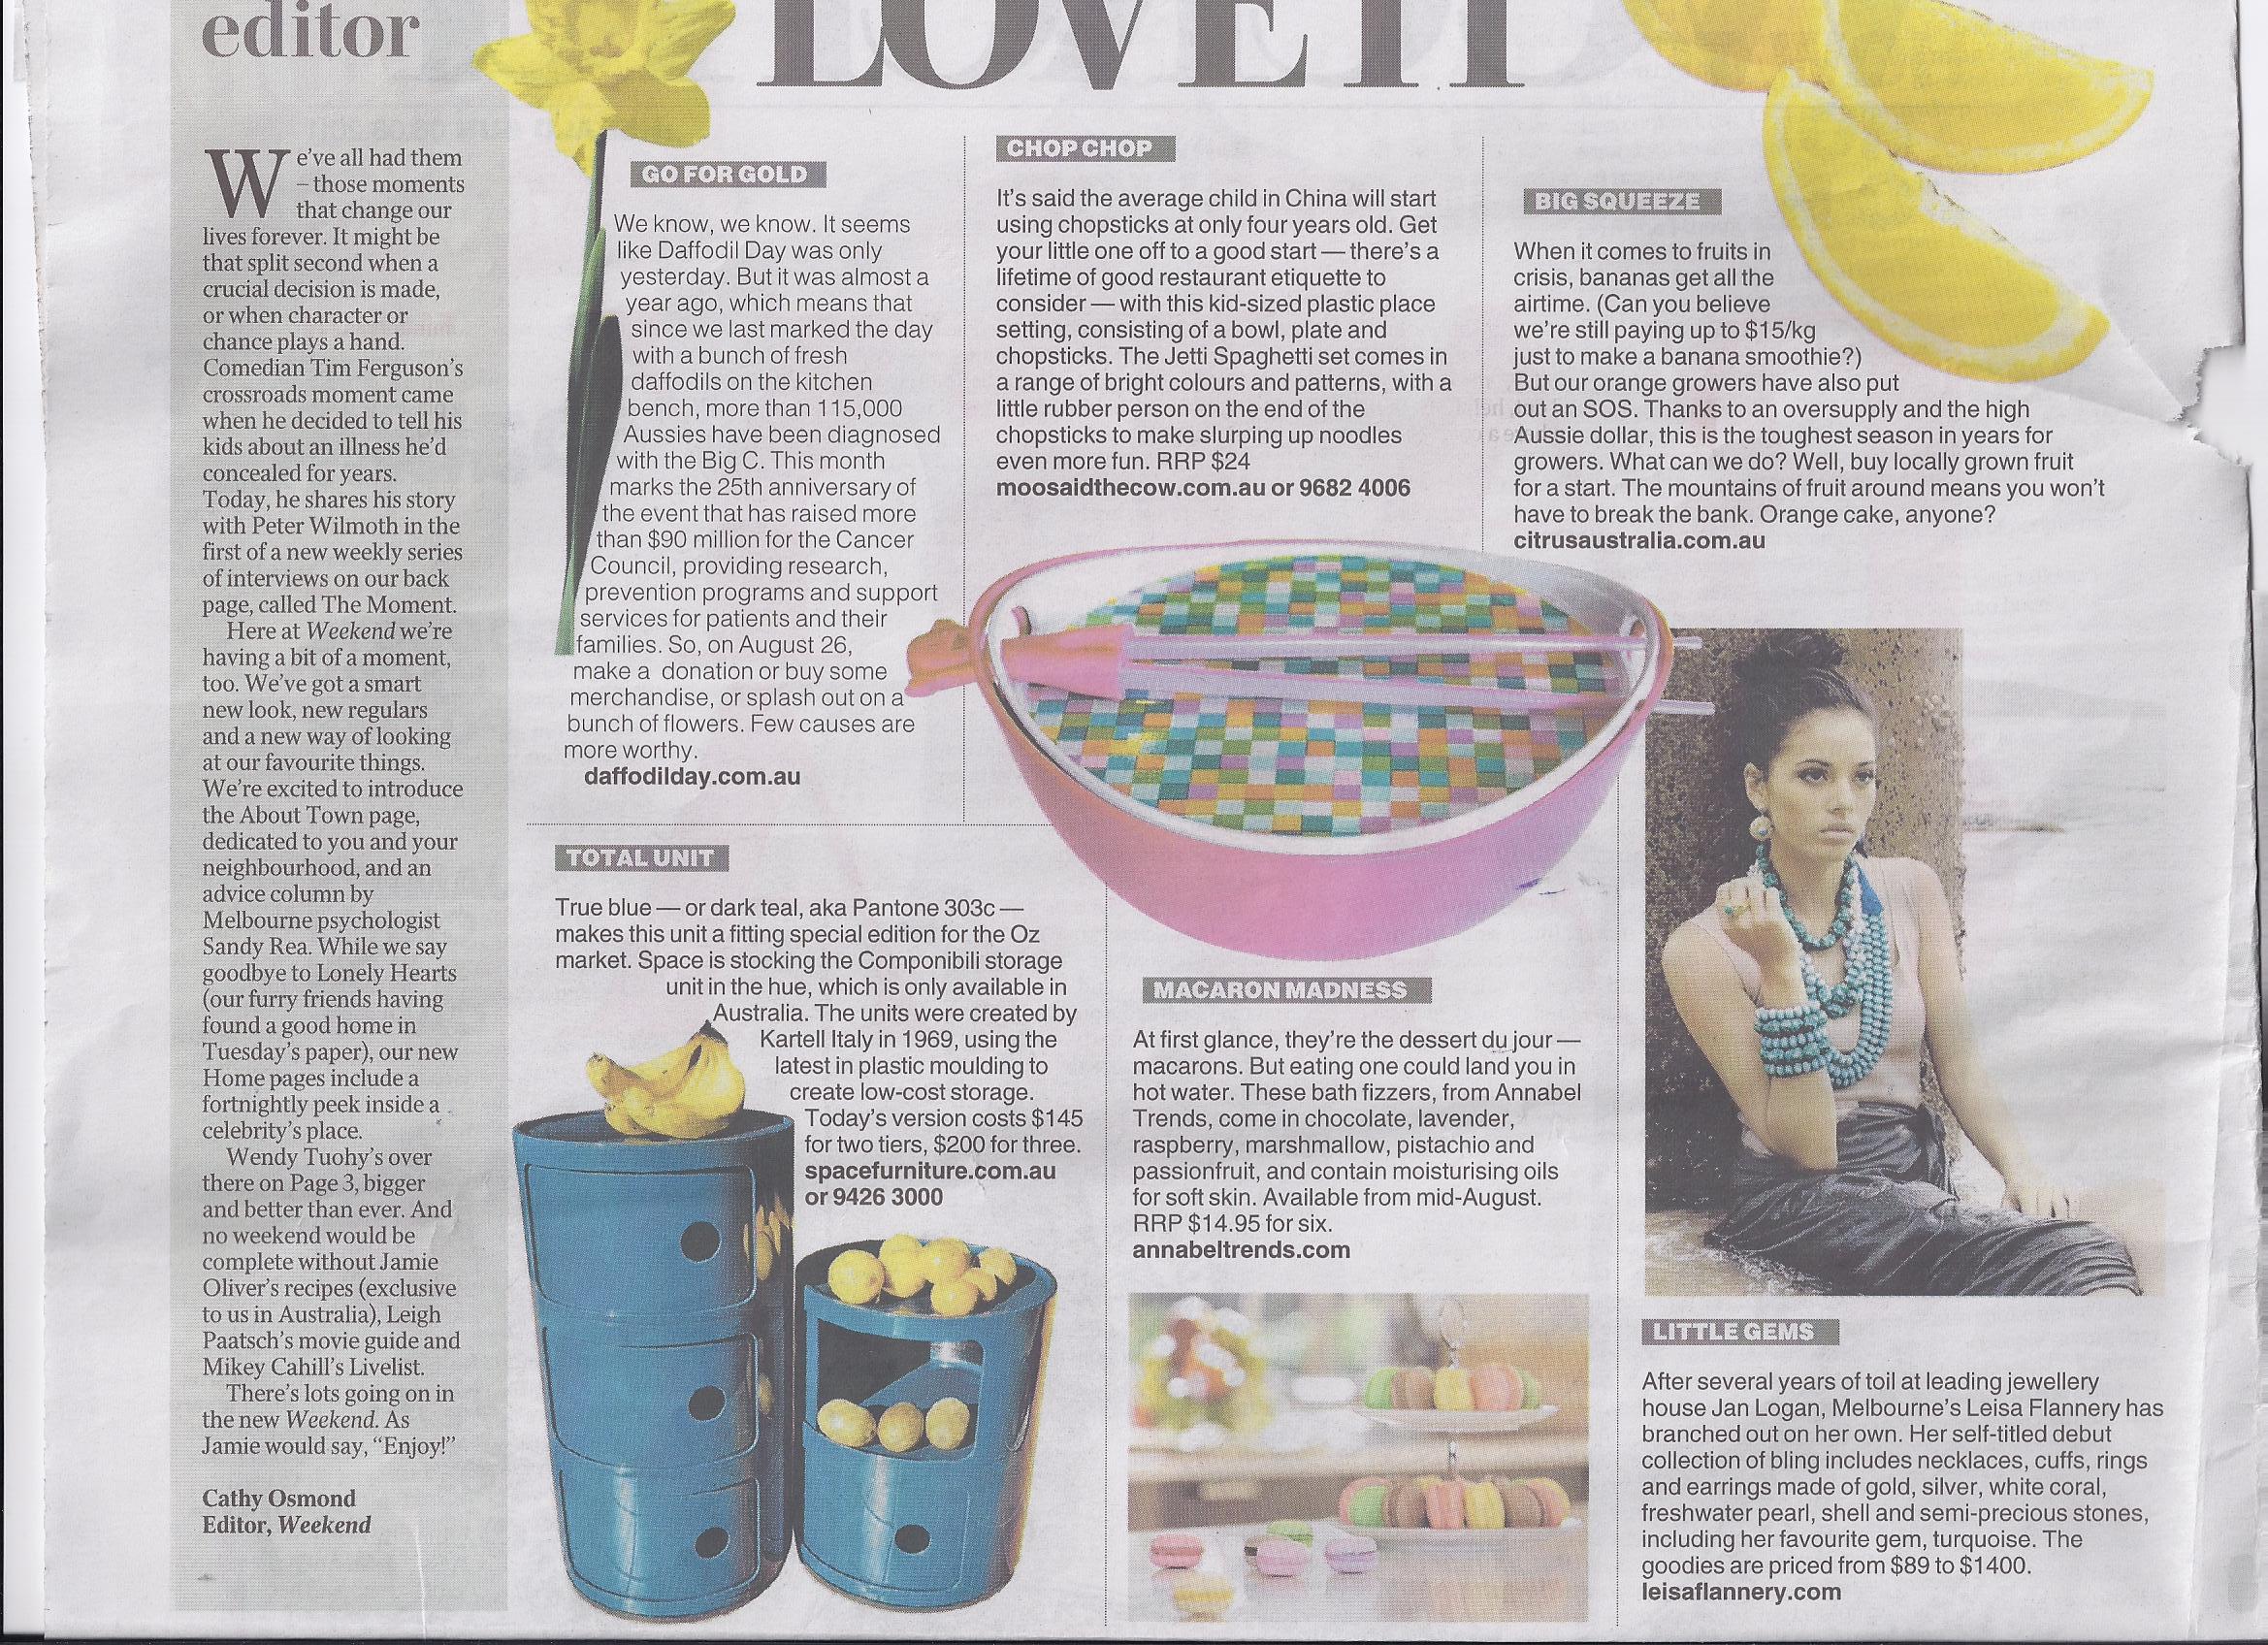 Herald Sun Love it 6th Aug 11.jpg